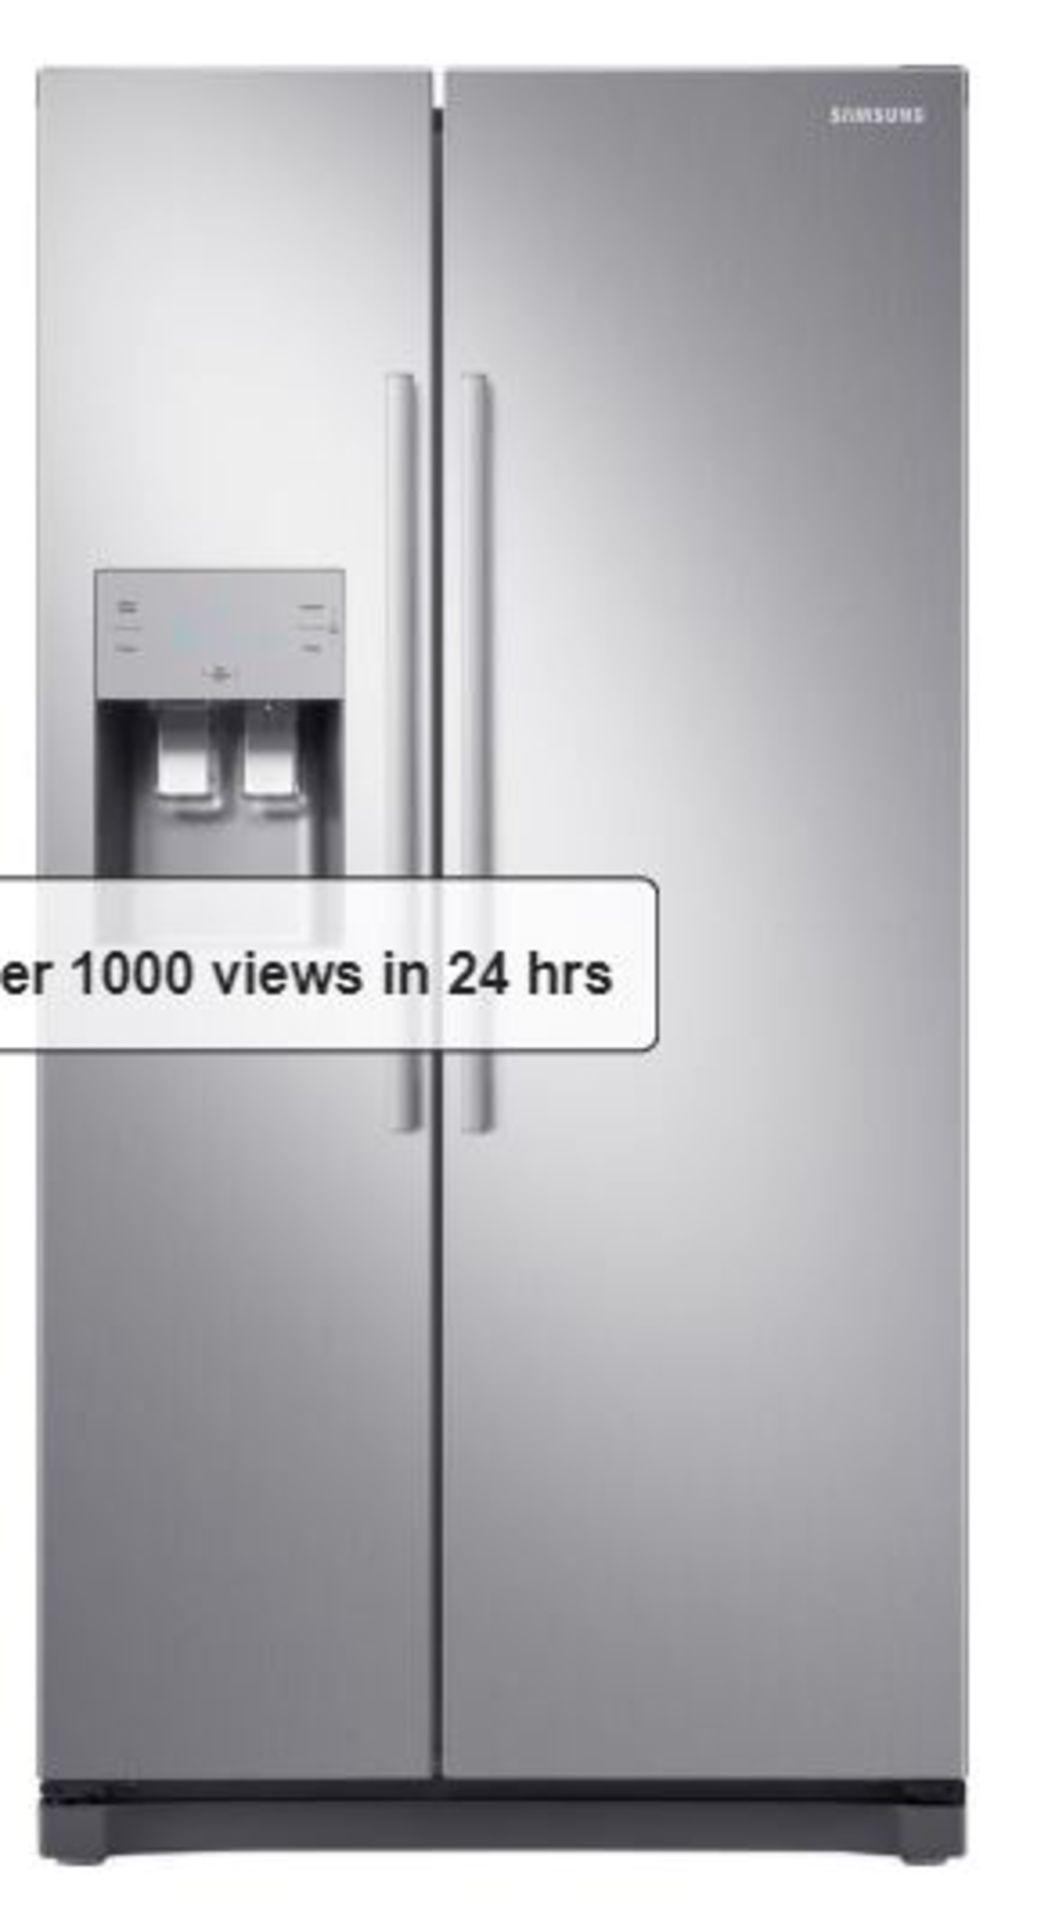 Pallet of 1 Samsung Water & Ice Fridge freezer. Latest selling price £929.99*